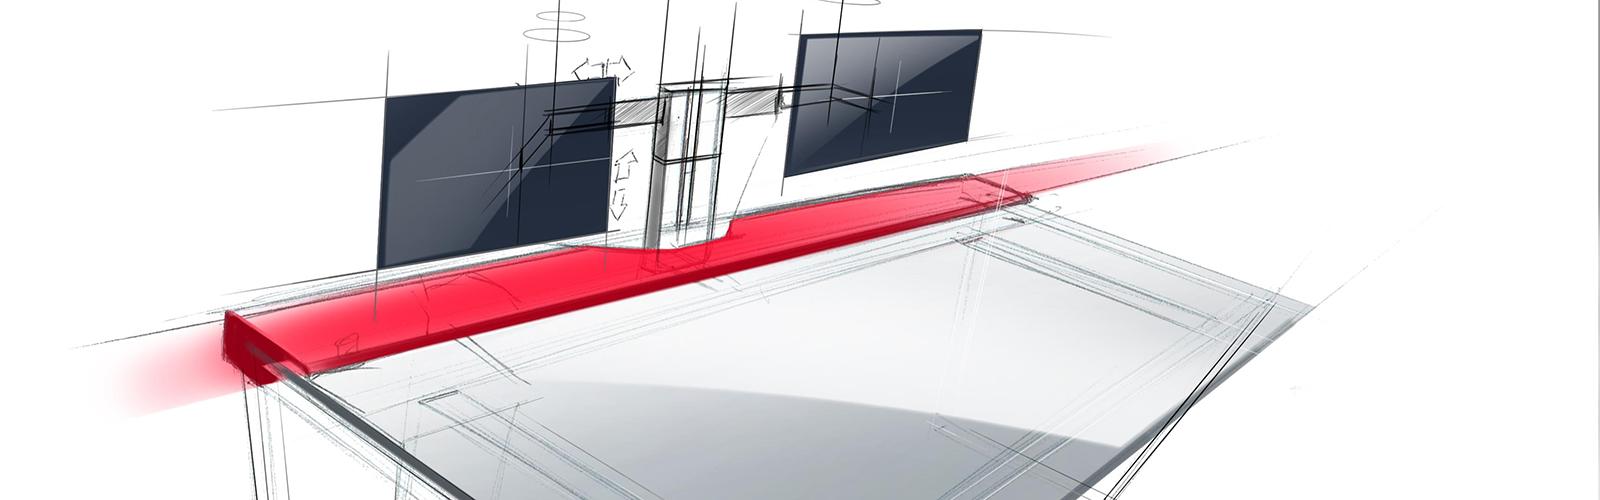 Braunwagner Produkt Design FEV vCAP 2018